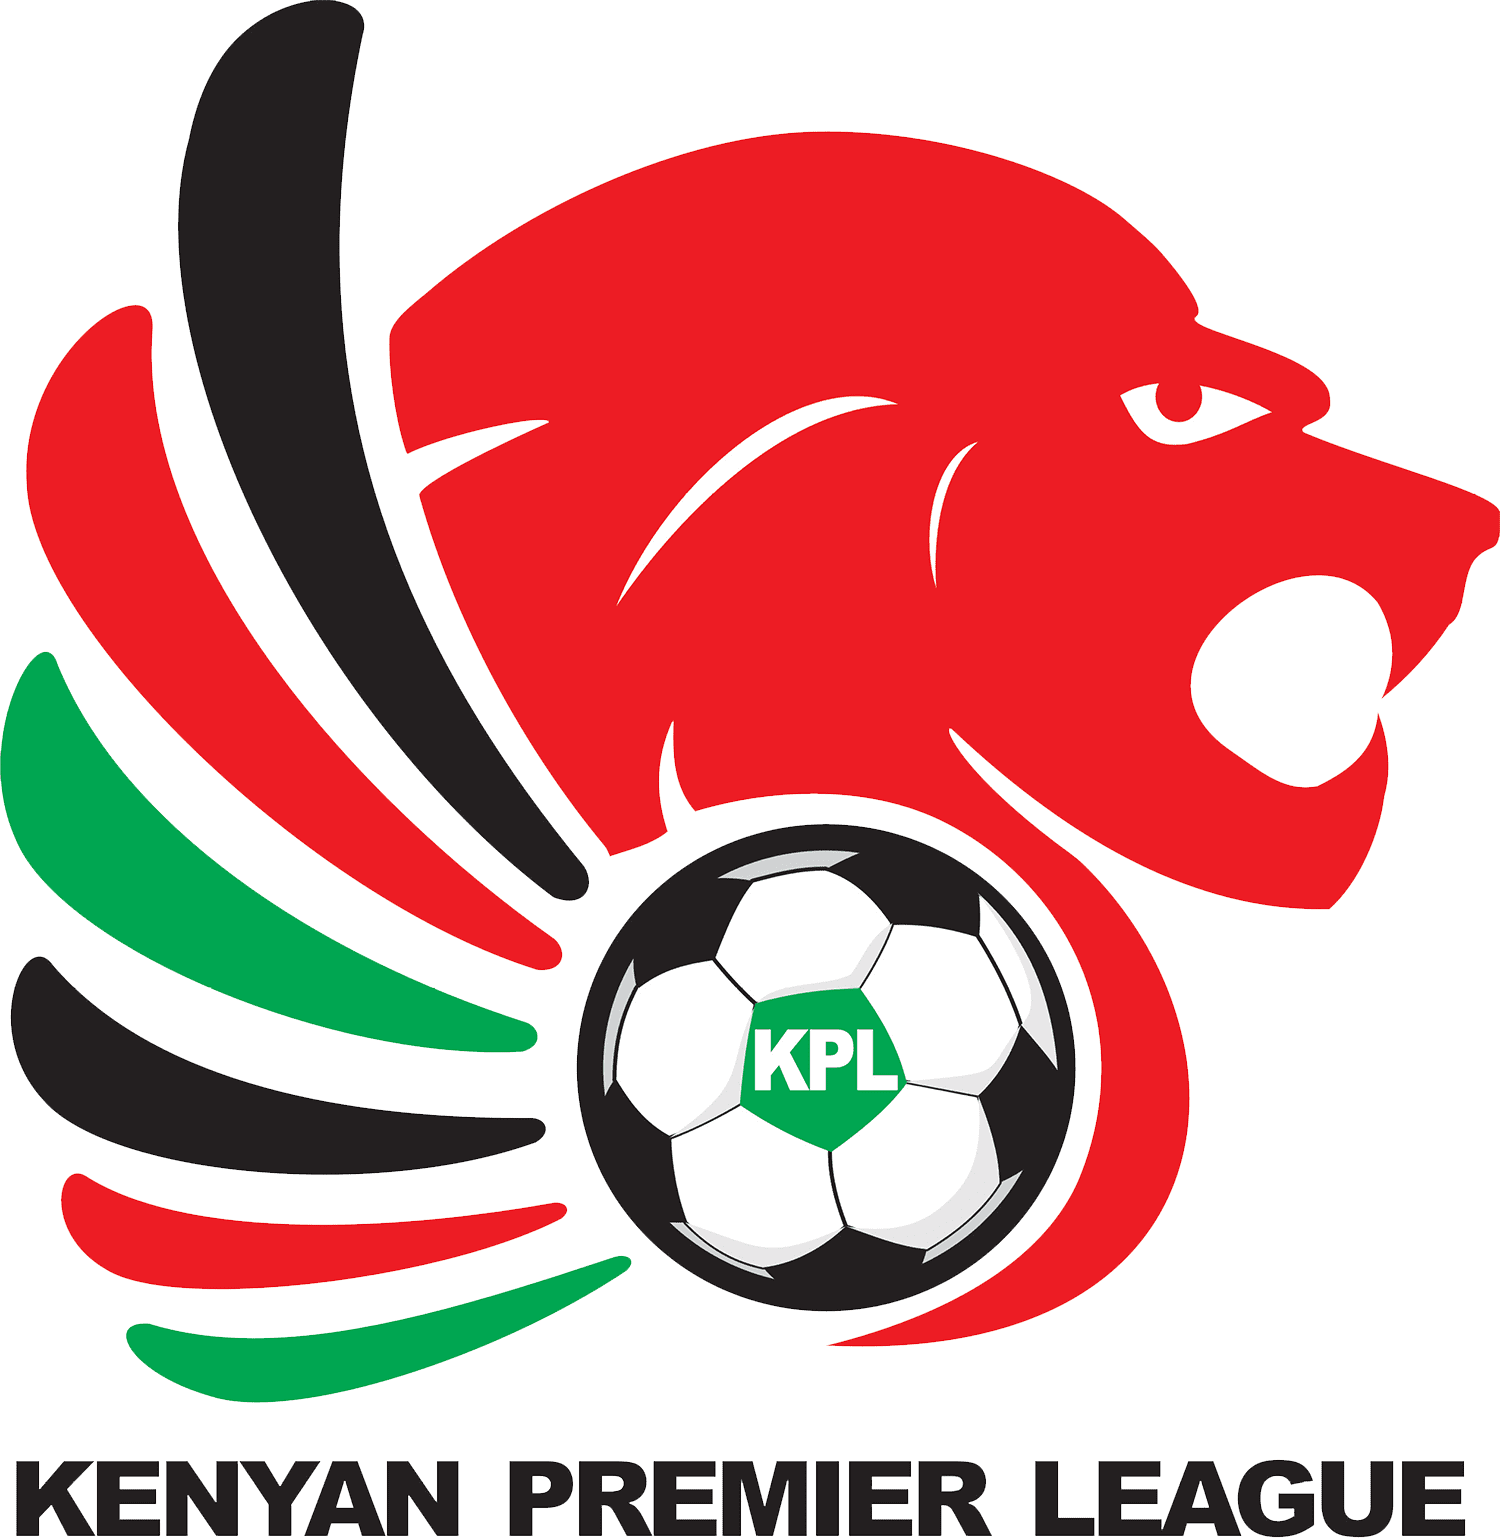 Betin kenya sport betting premier league lockouts and strikes professional sports betting